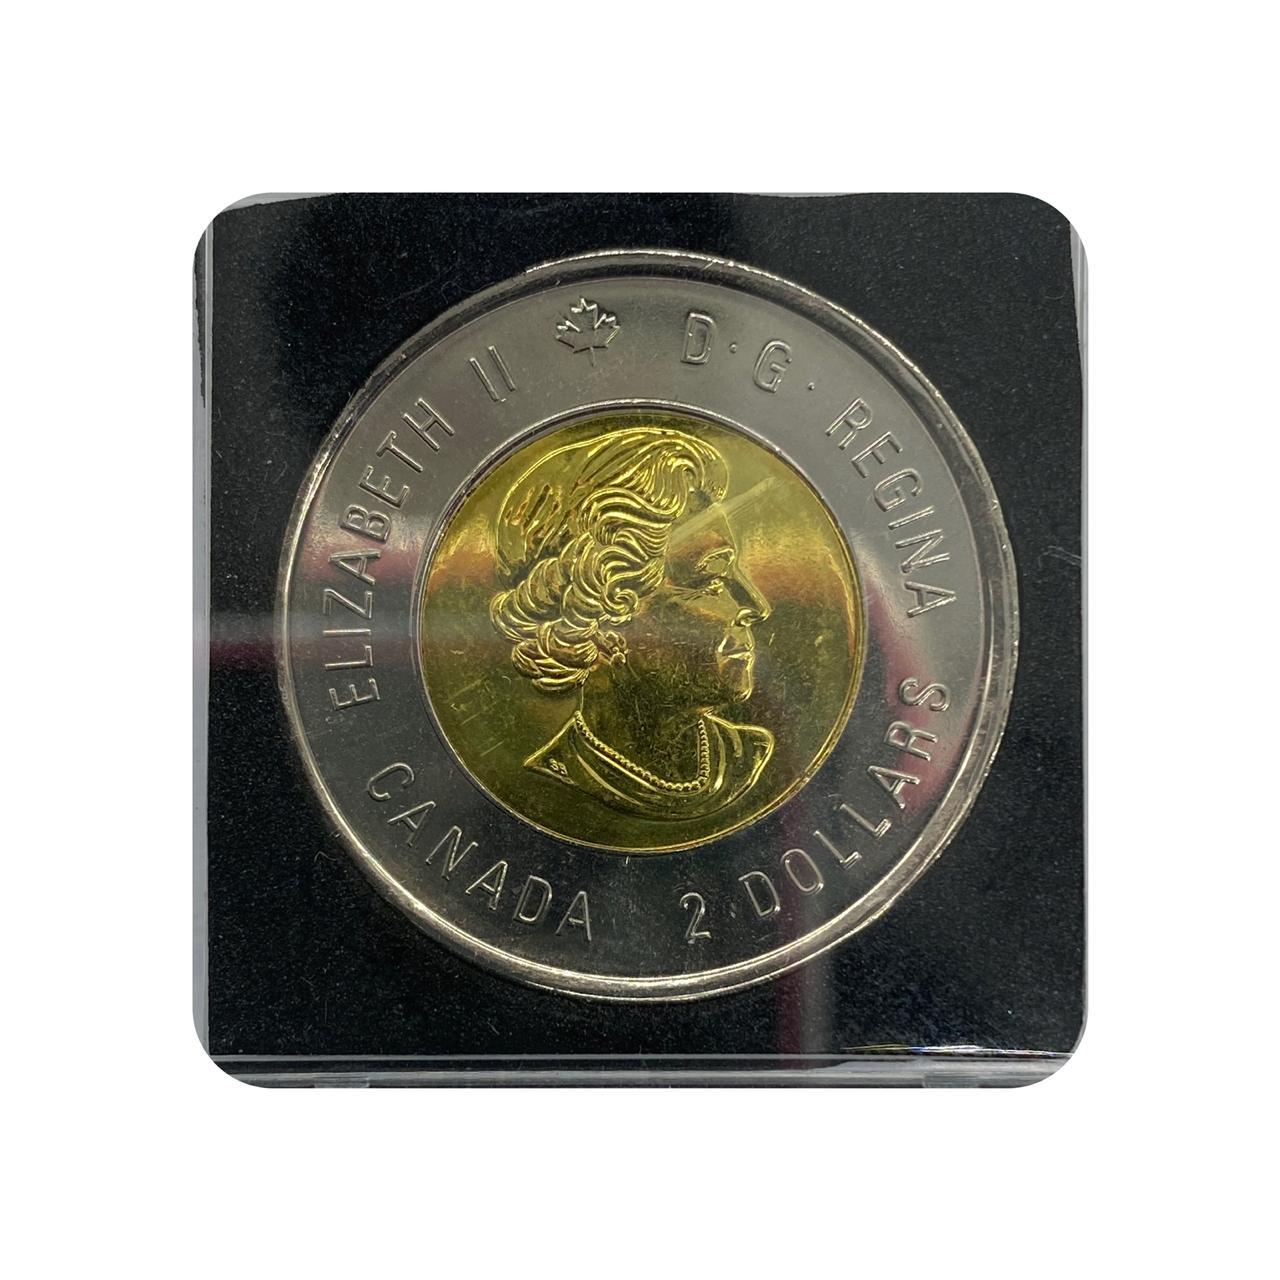 Moeda Canadá Comemorativa 75º Aniversário - 2ª Guerra Mundial 2 dólares 2014 FC